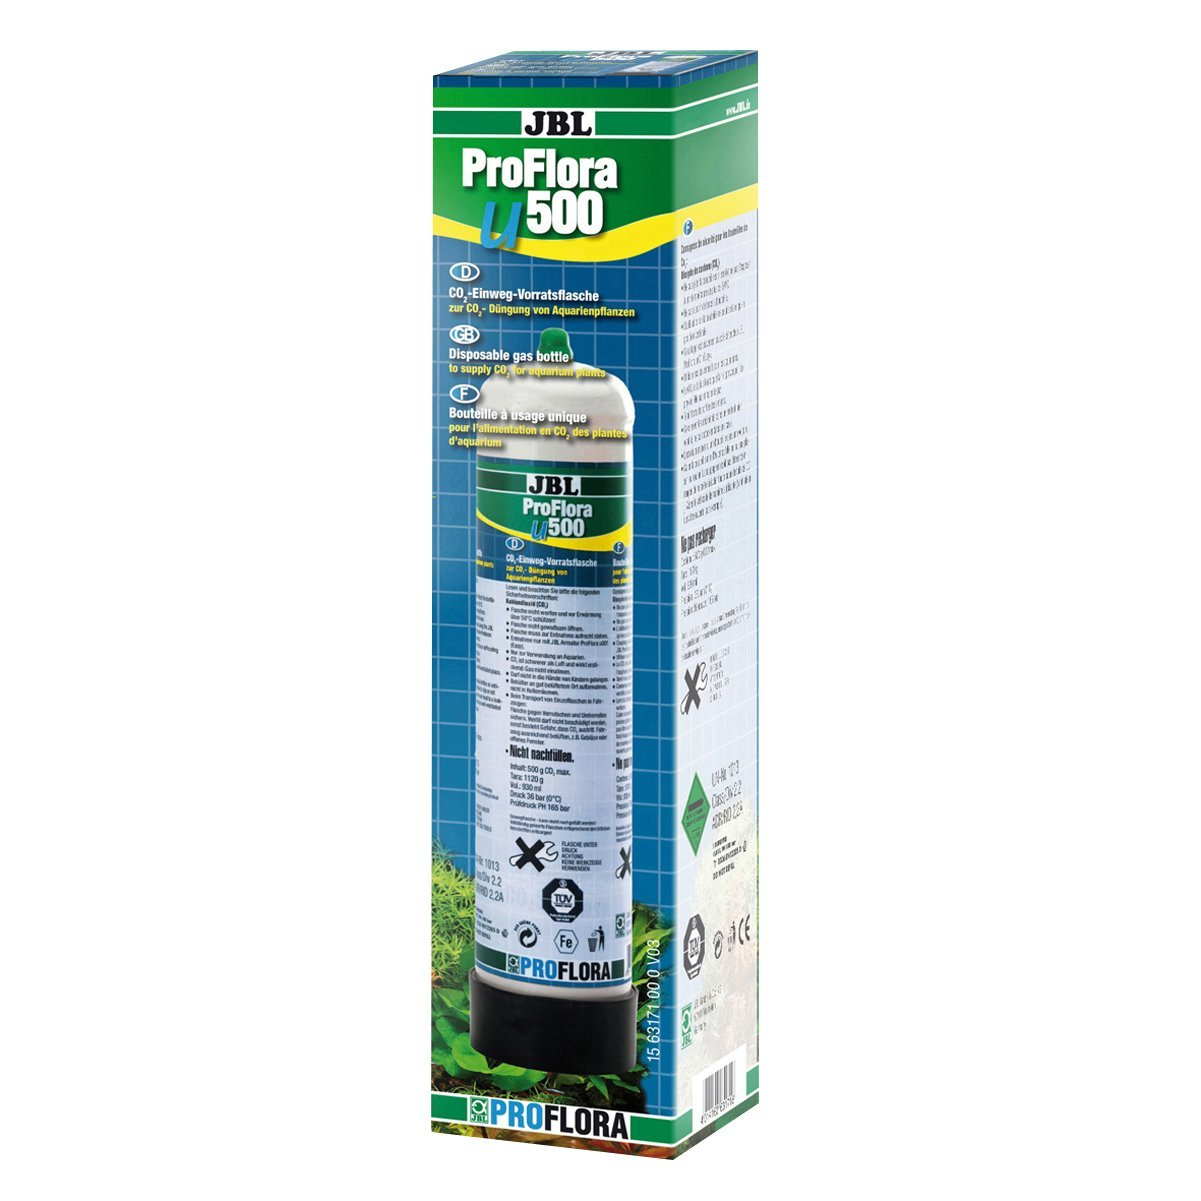 JBL ProFlora u500 (BOUTEILLE CO2 500GR) JBL